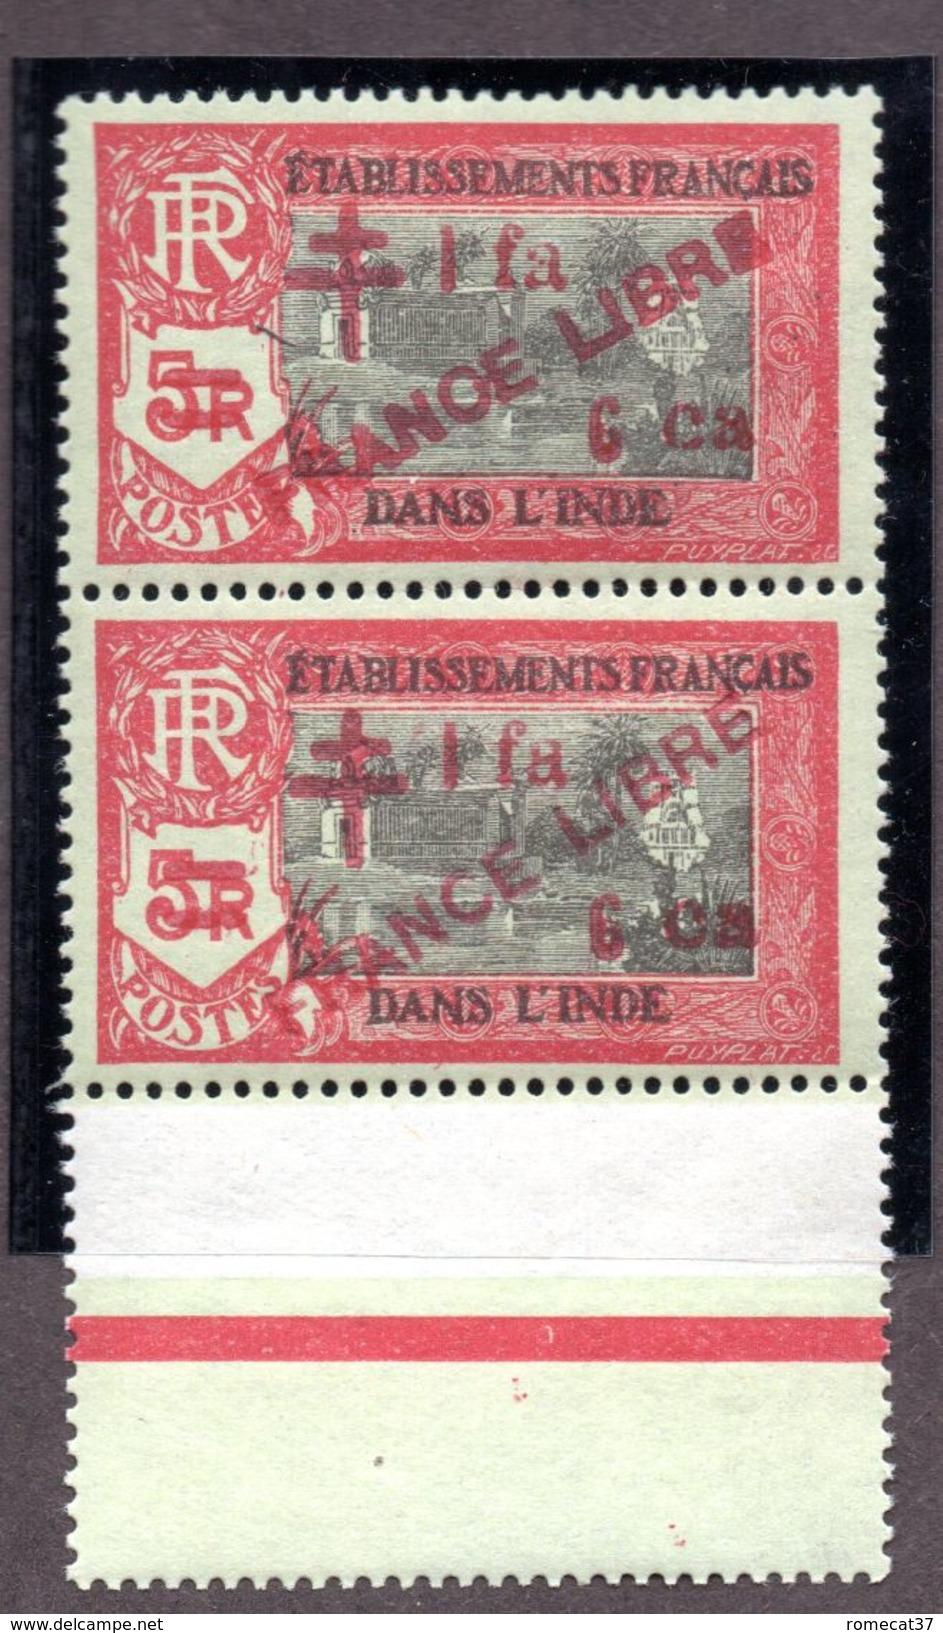 "INDE  N°257b+257 ""FRANOE LIBRE"" N** LUXE Cote 88 Euros !!!RARE - India (1892-1954)"